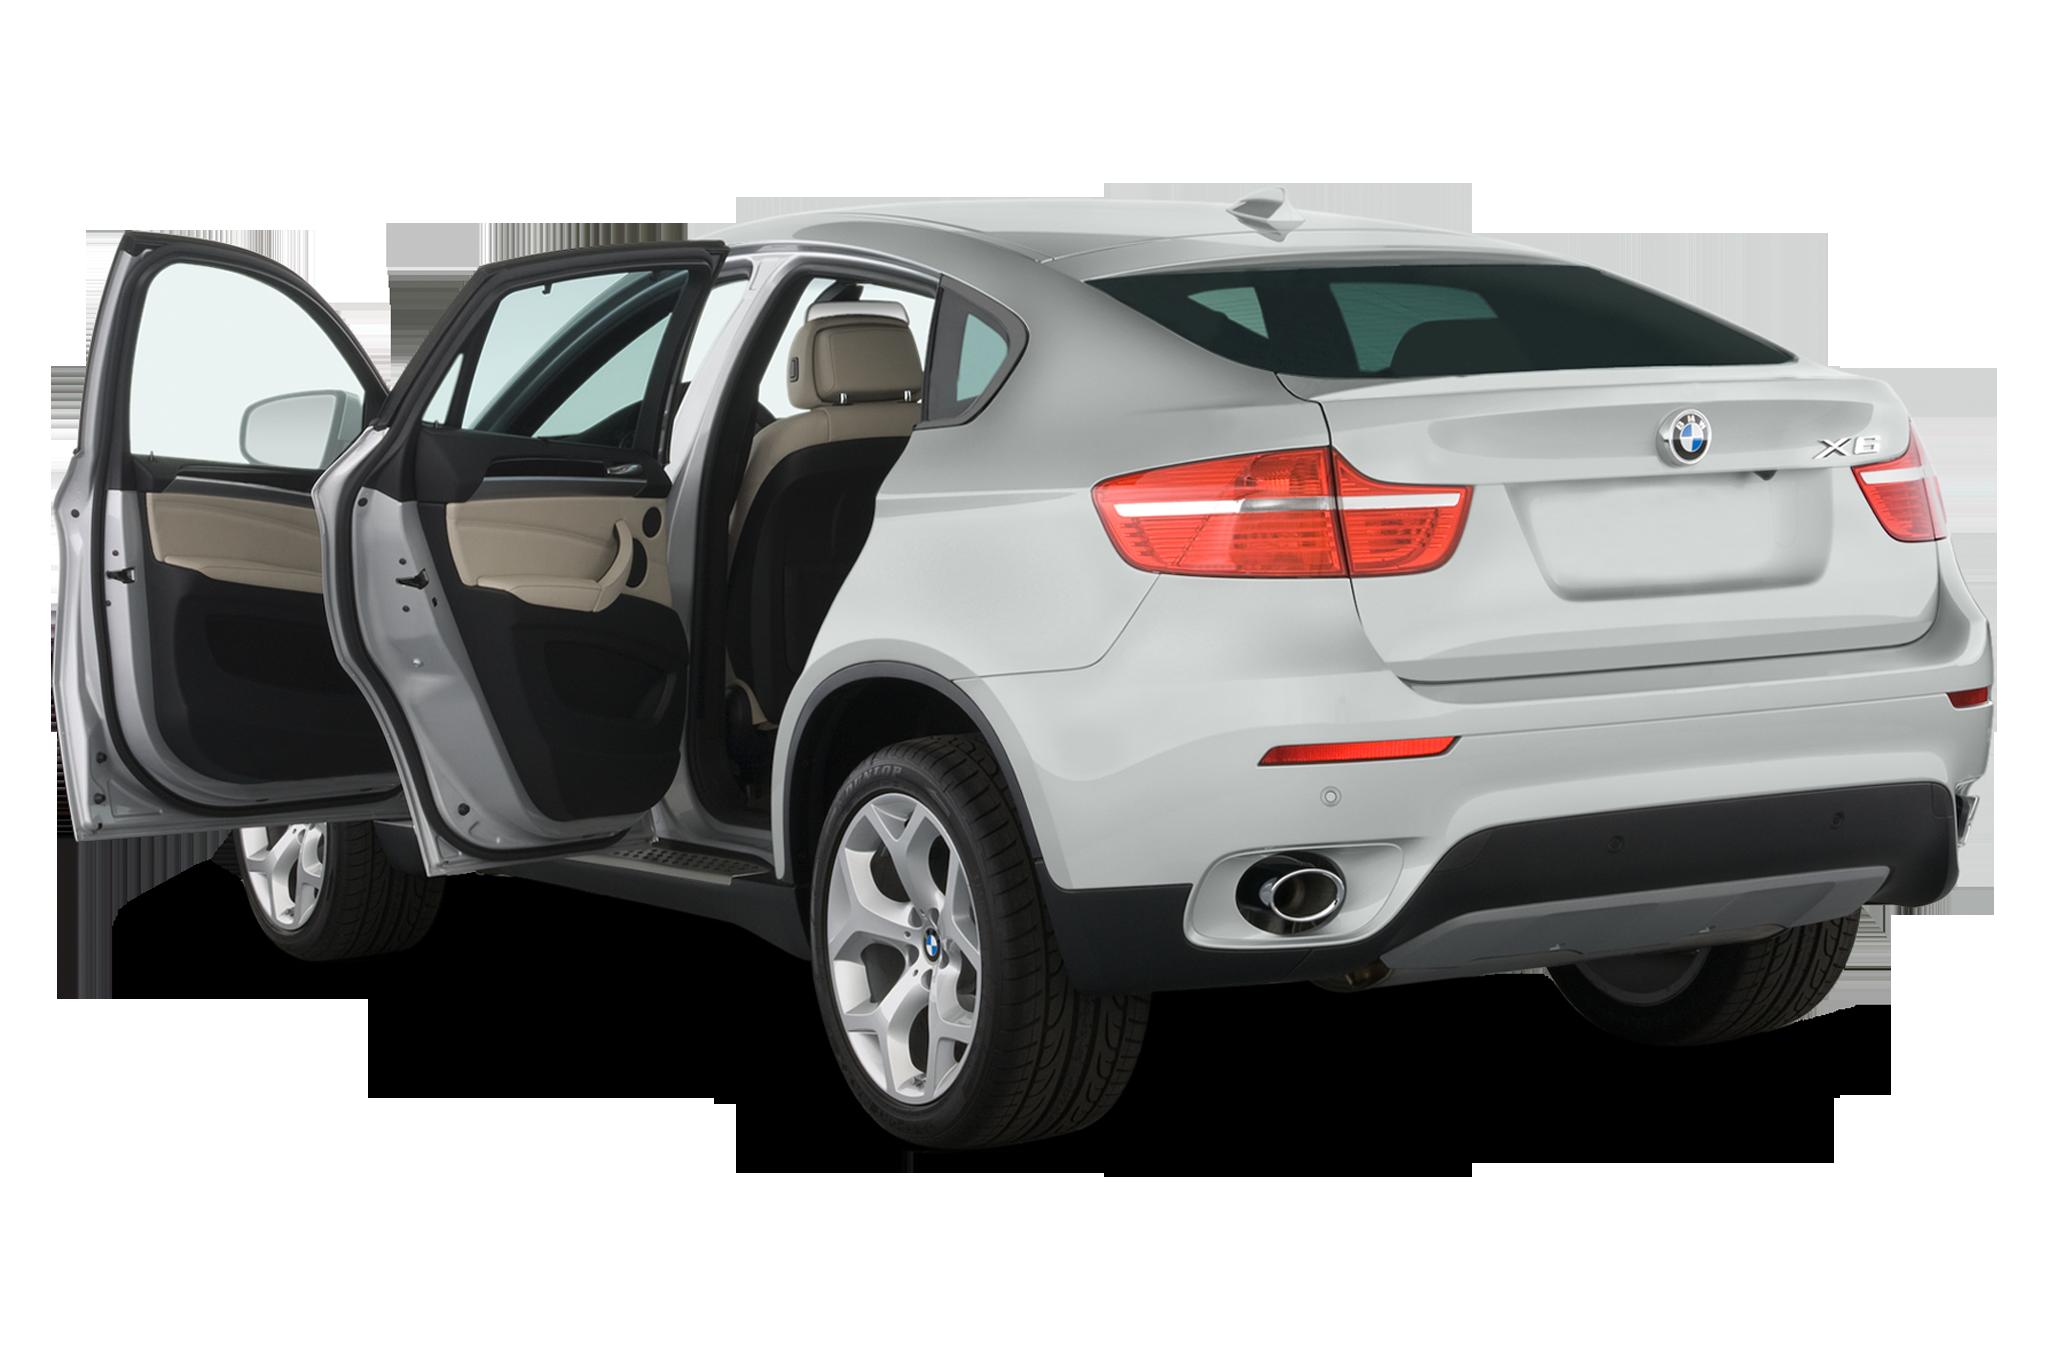 BMW X6 M I (E71) 2009 - 2012 SUV 5 door #7